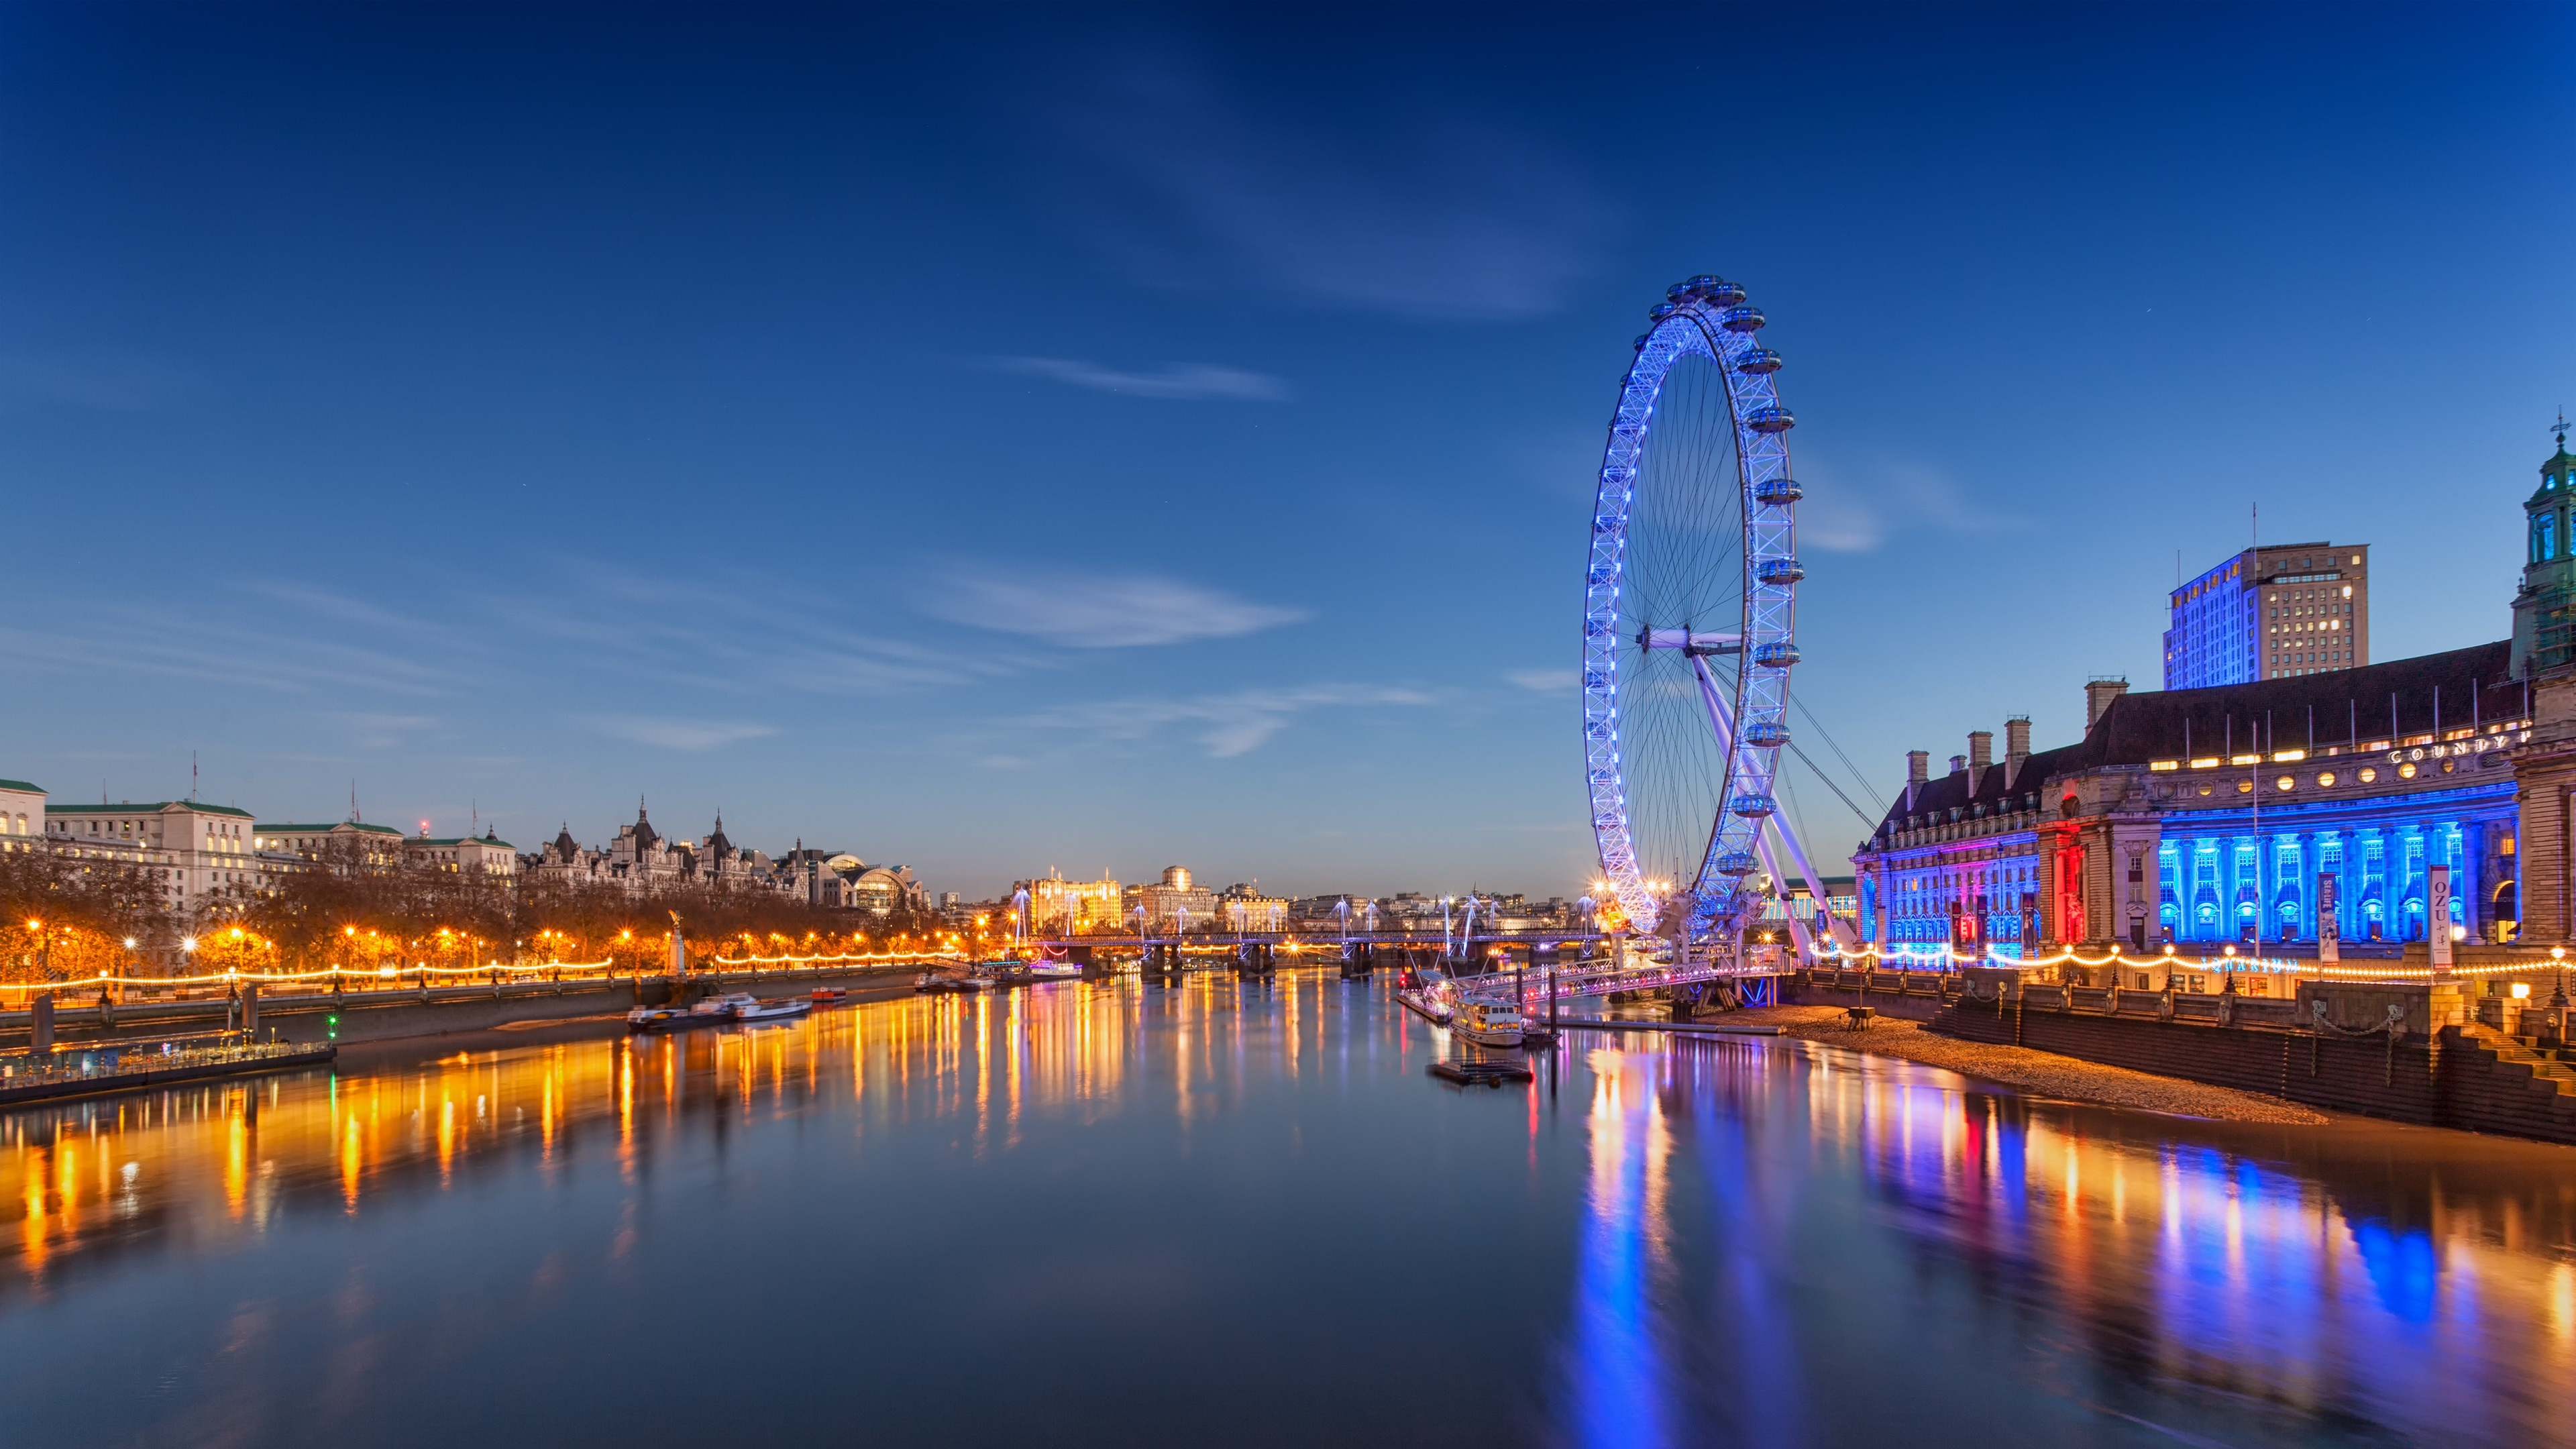 london-eye-945497